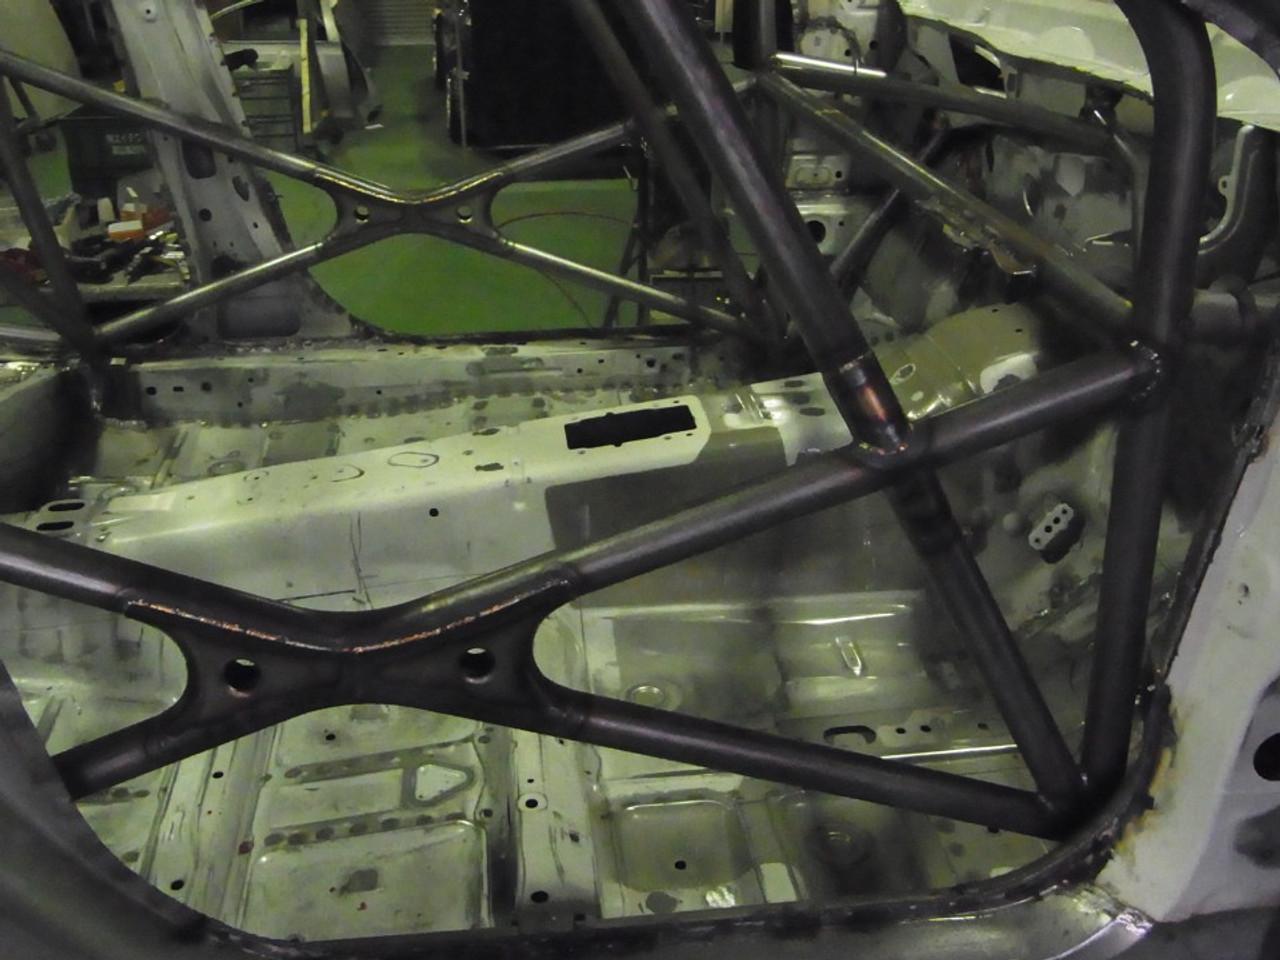 Custom Cages Subaru Impreza GP/GJ - International Multipoint GrpN [T45]